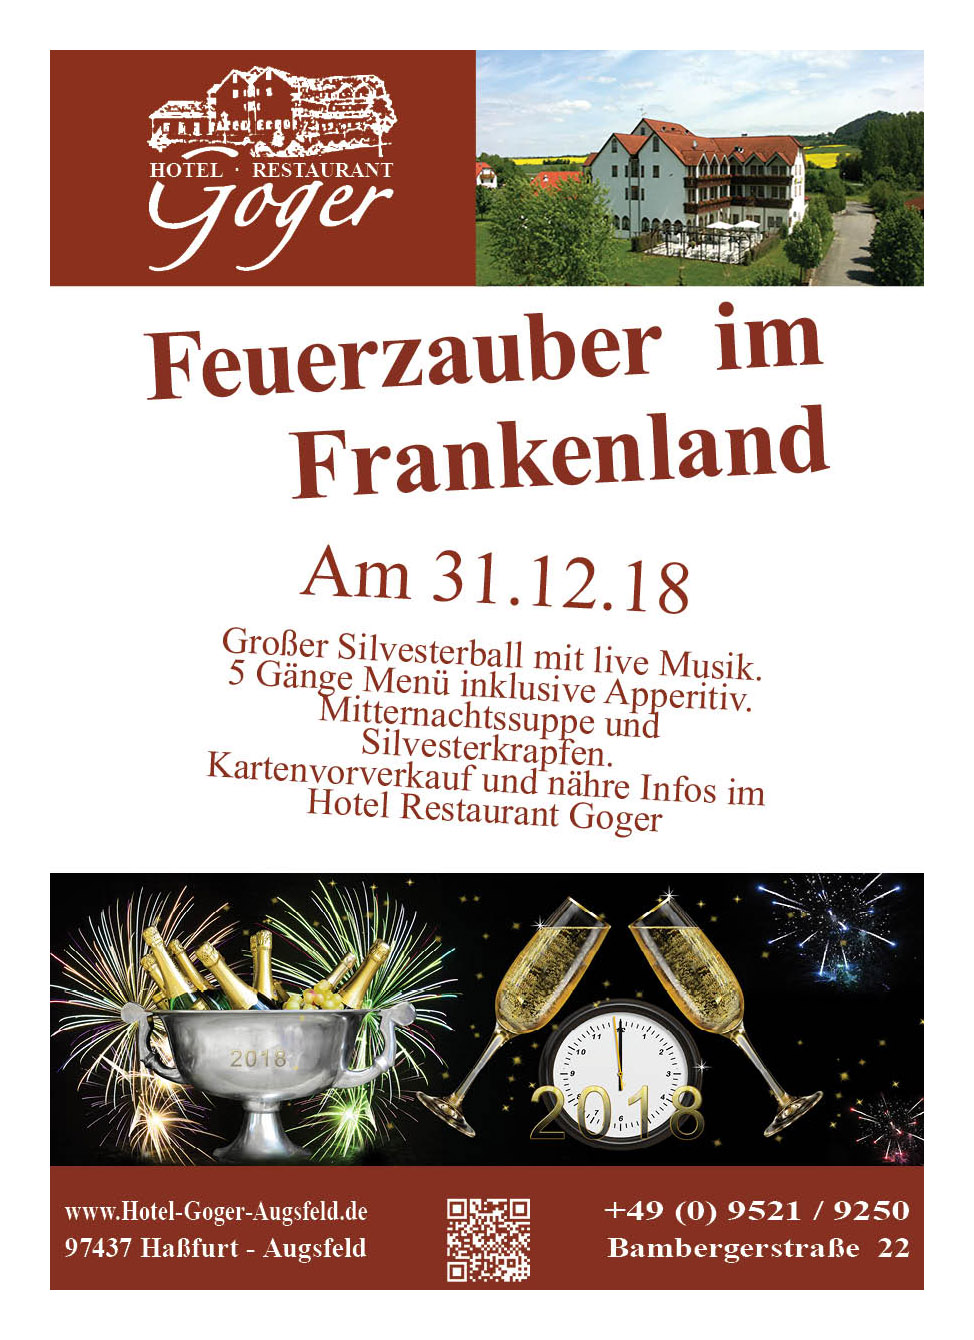 Hotel Restaurant Goger Haßfurt Sylvesterball